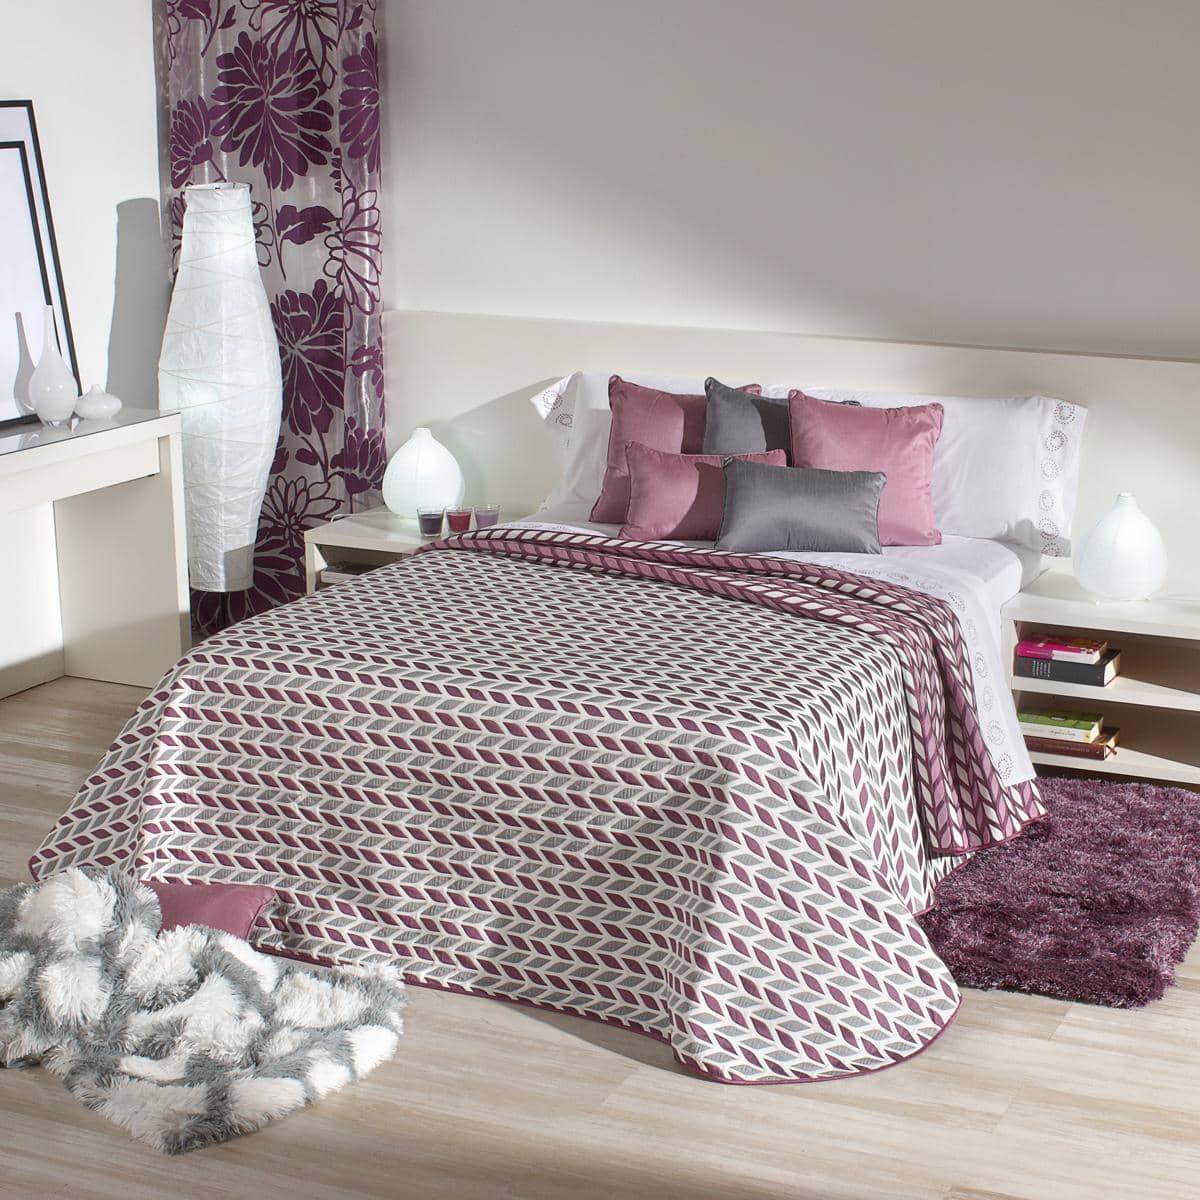 Colchas baratas y bonitas para tu cama colch n expr s for Colchas para camas de 150 con canape